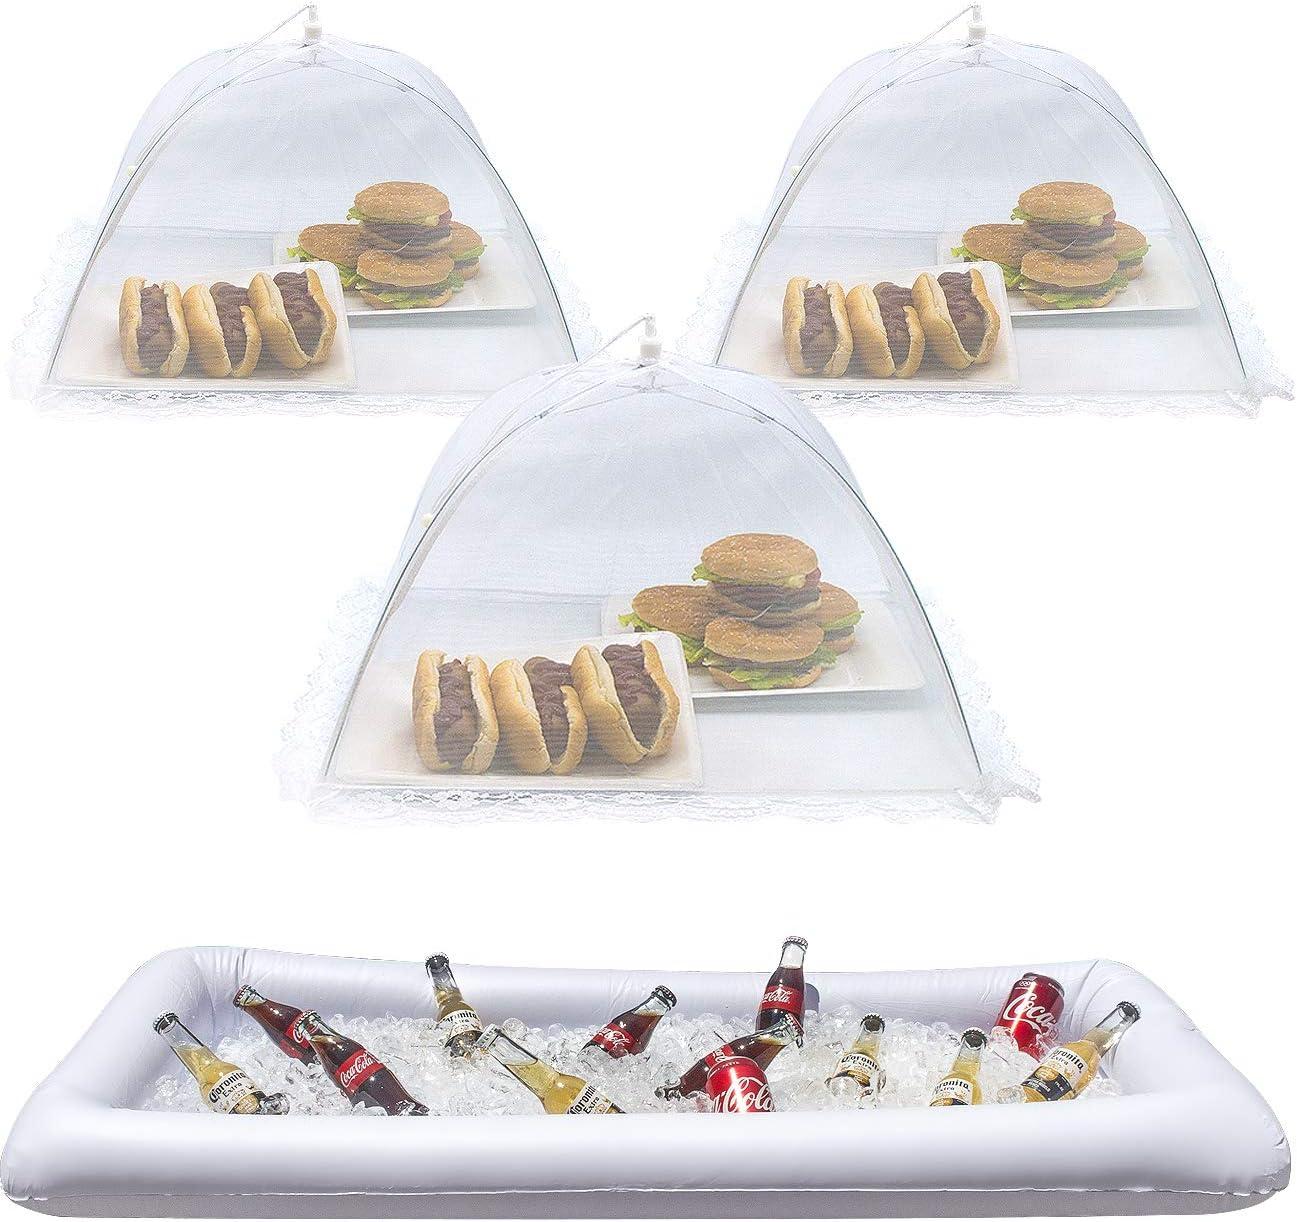 Sorbus Inflatable Serving Bar & Food Umbrella mesh Cover Screen Tent Set for Food and Beverages, Perfect for BBQ, Picnic Pool Outdoor Party Supplies, Buffet Luau Cooler,1 Salad Bar 3 Food Umbrellas